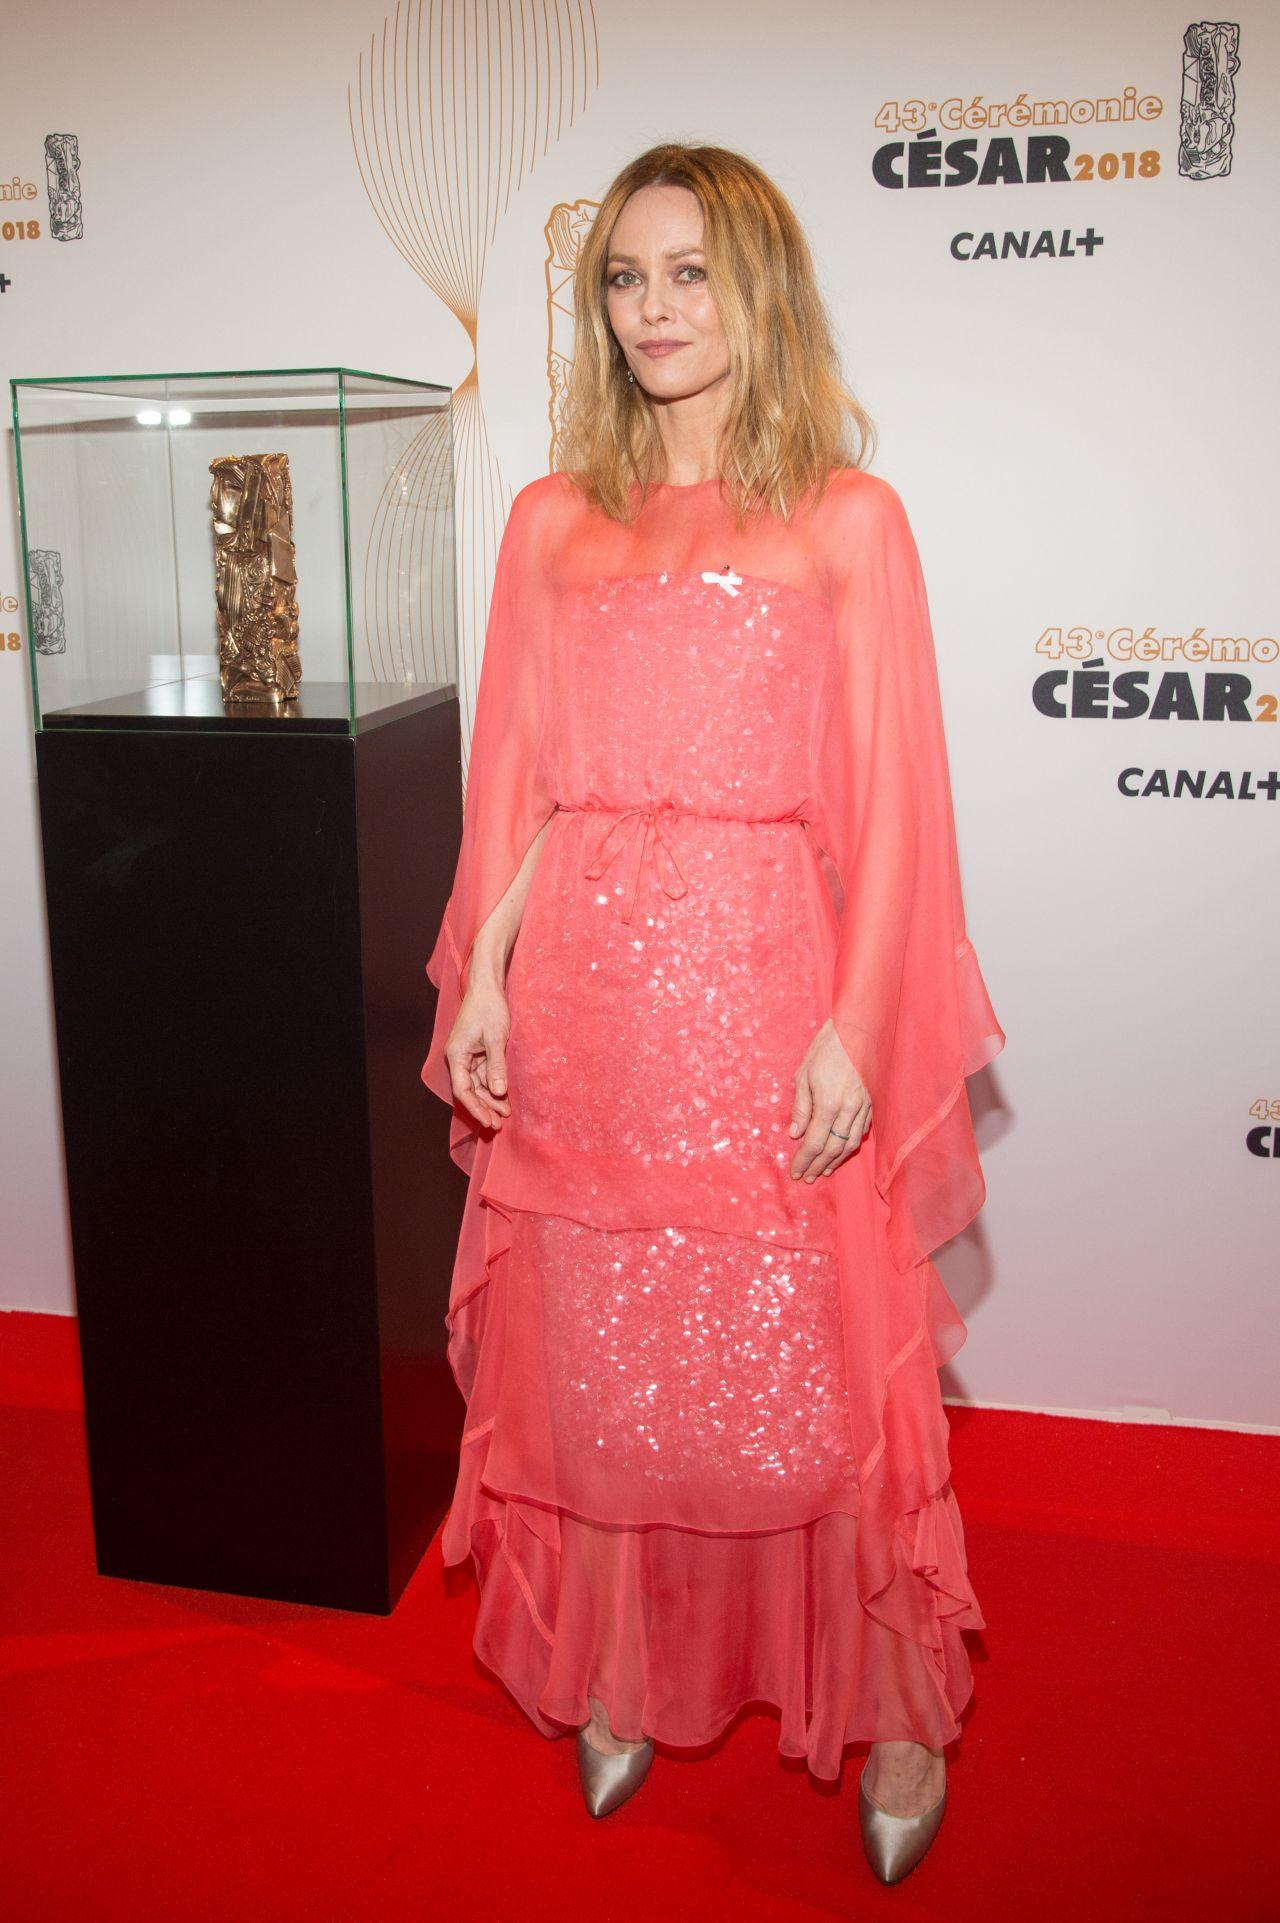 http://celebmafia.com/wp-content/uploads/2018/03/vanessa-paradis-cesar-film-awards-2018-in-paris-1.jpg